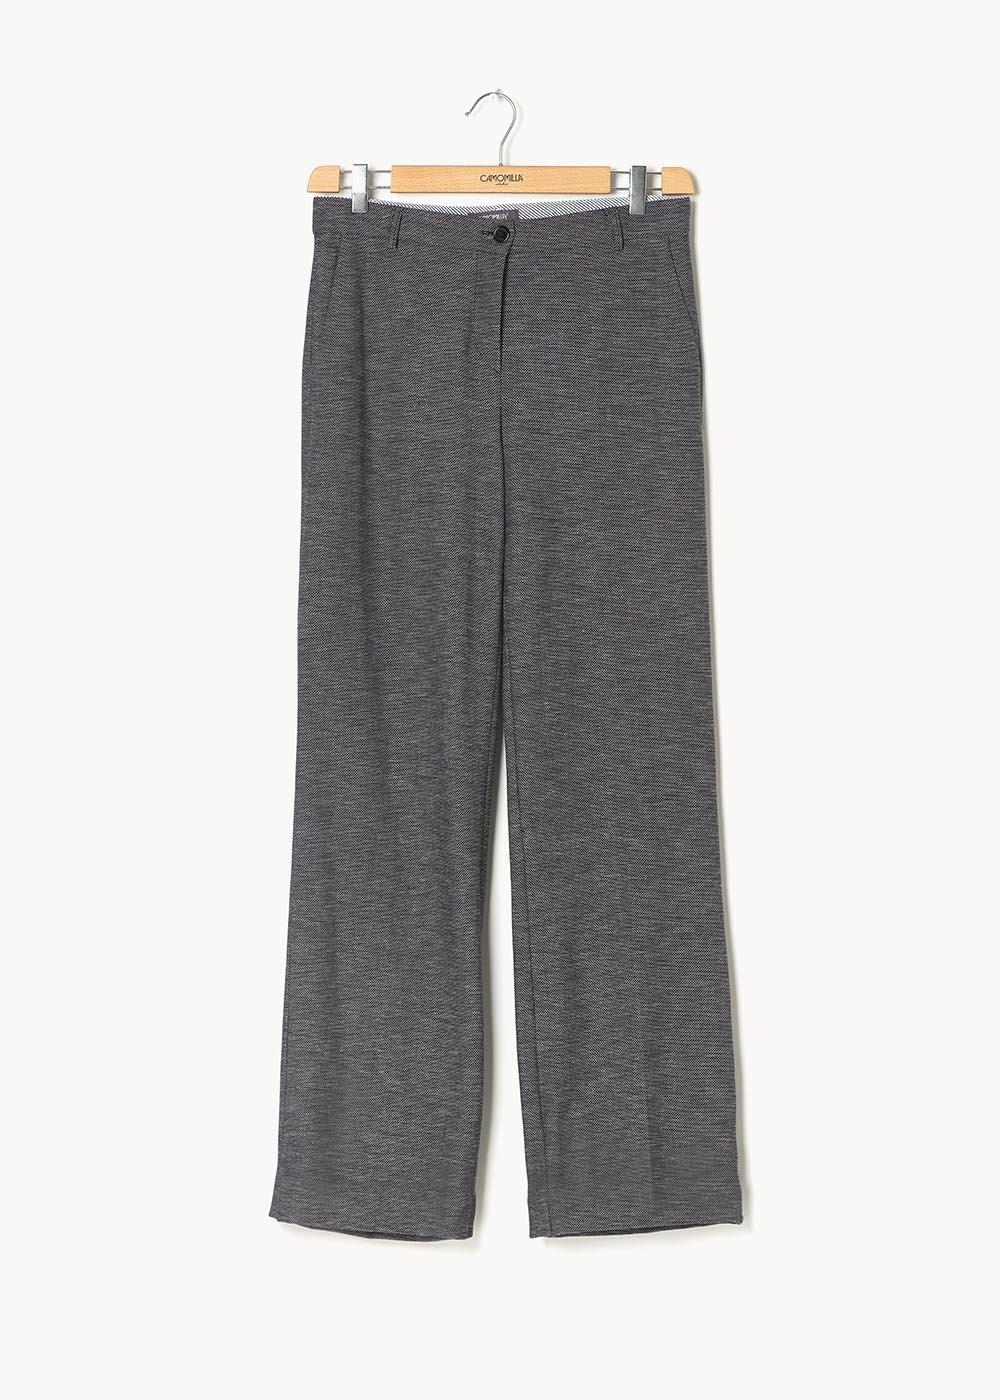 Pantalone modello Giorgia effetto stuoietta - Blu / White / Fantasia - Donna